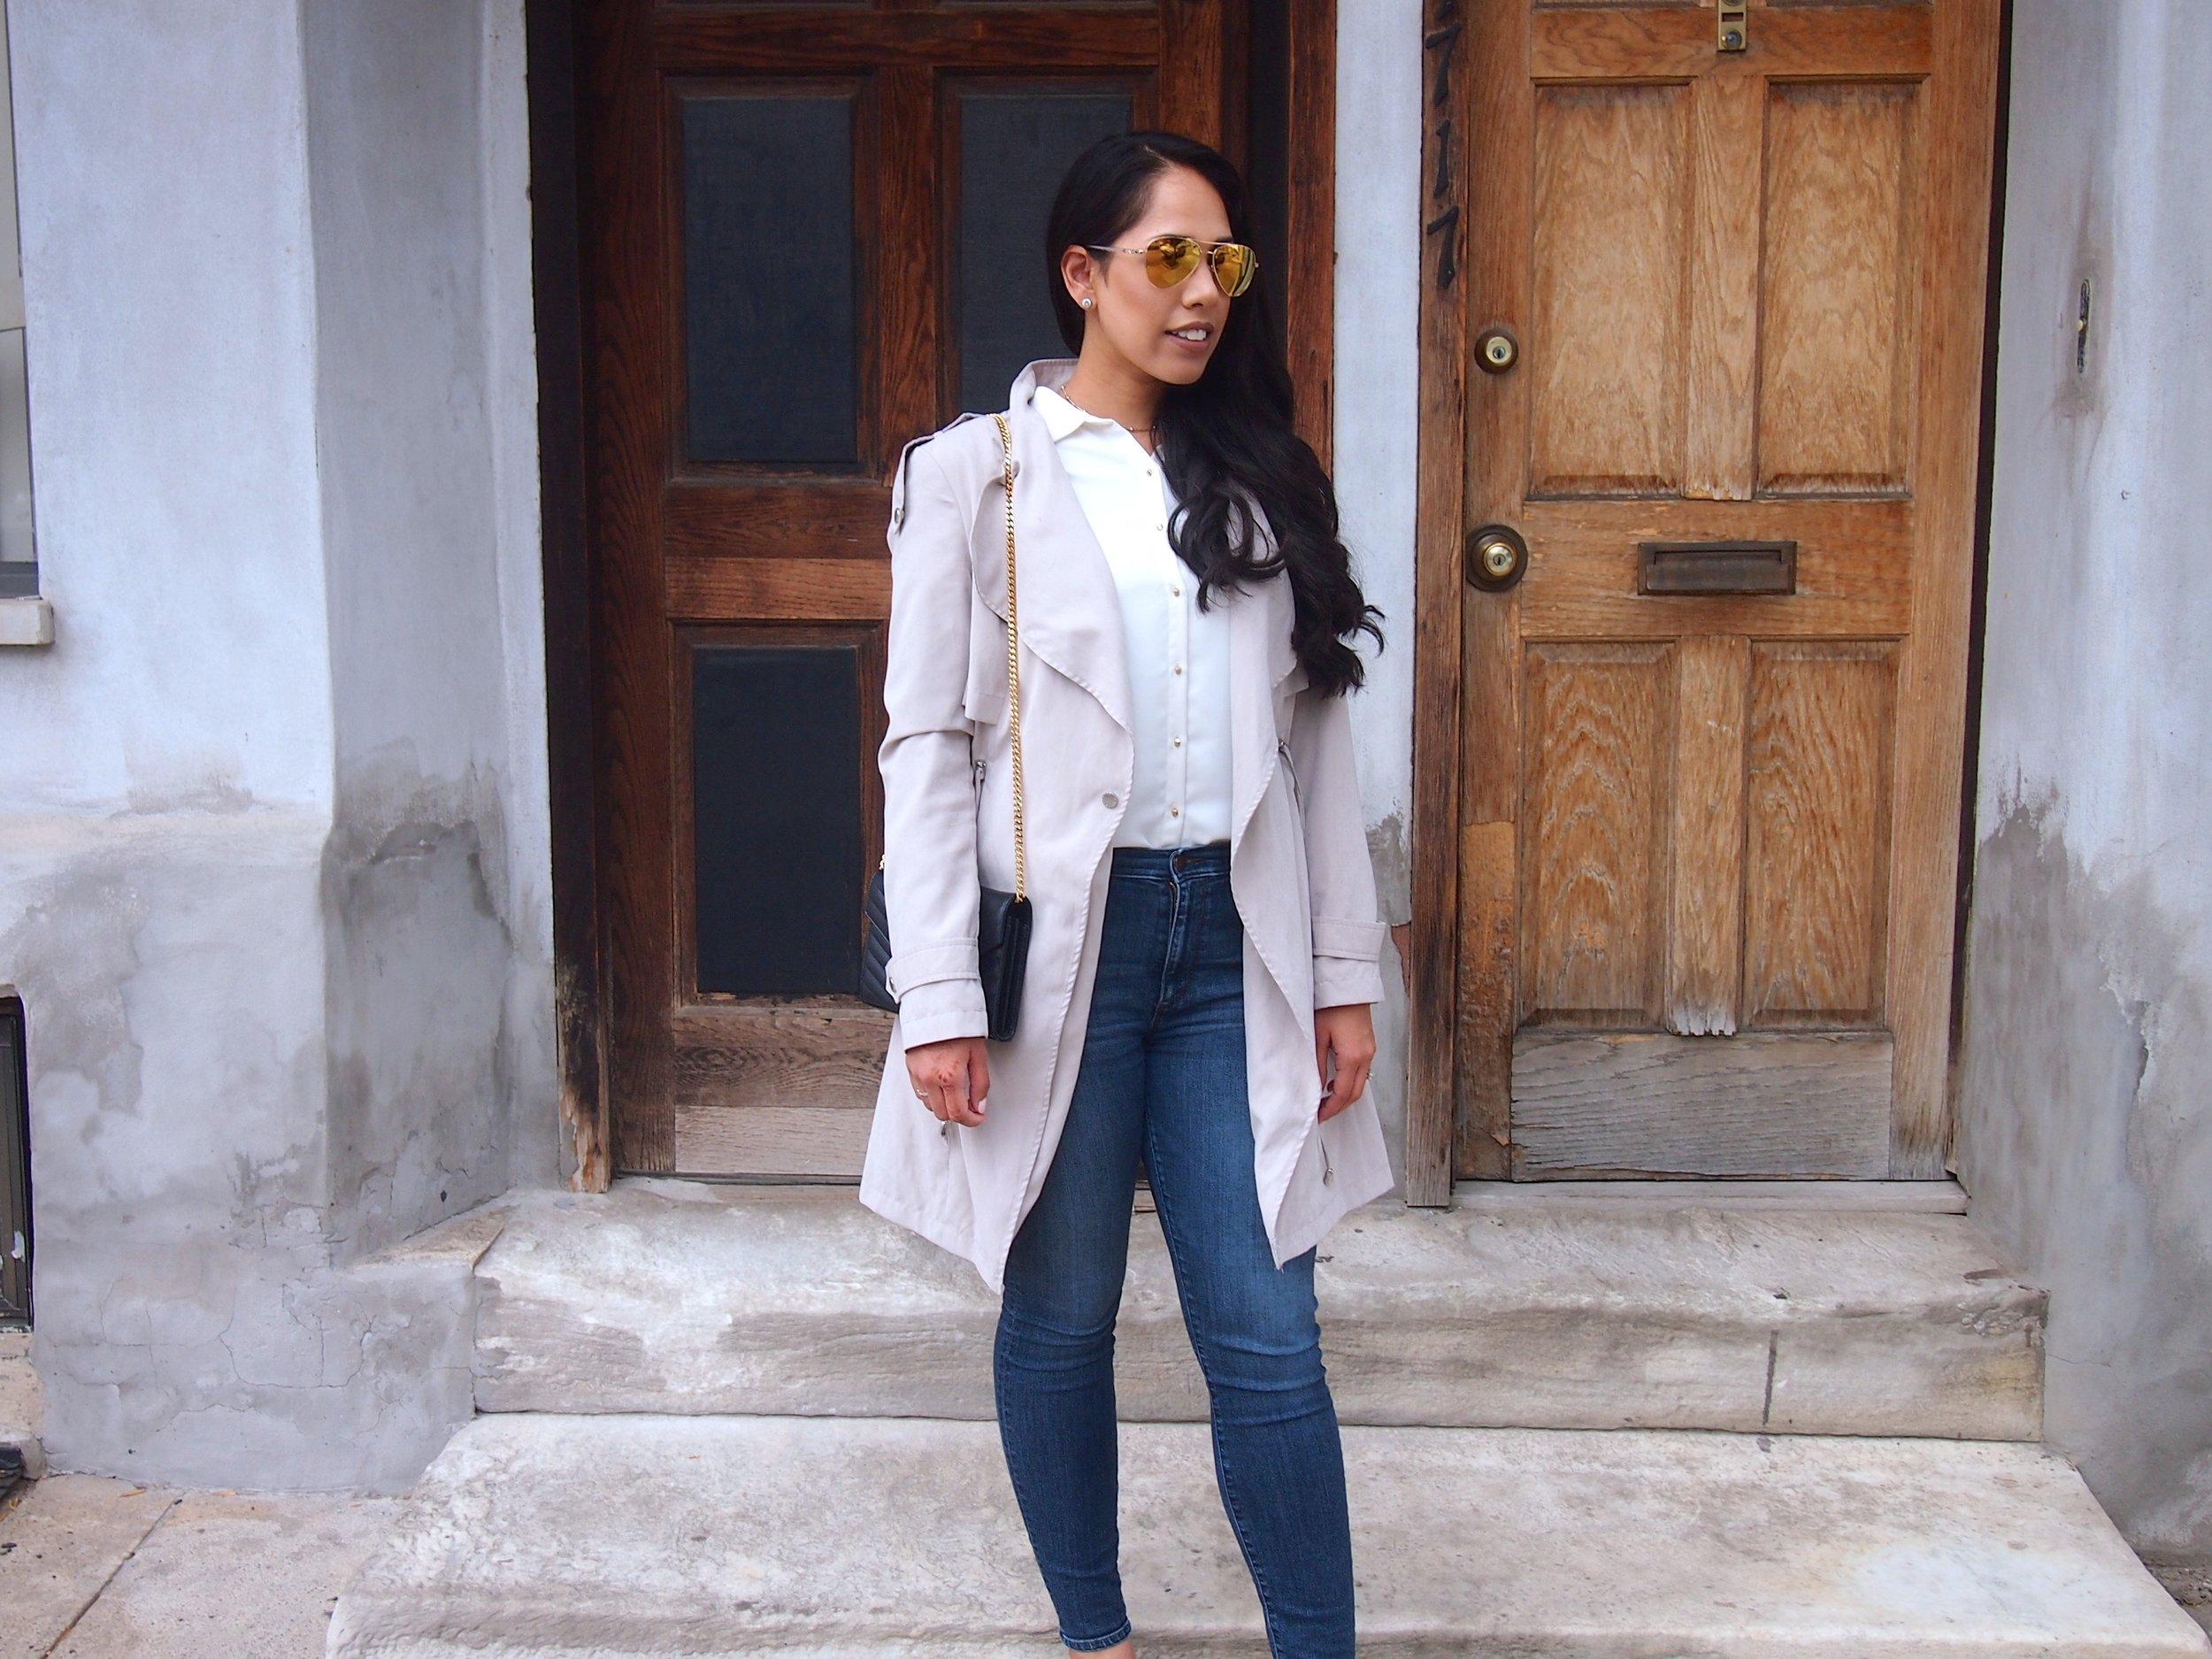 philadelphia-blogger-fall-fashion.jpg